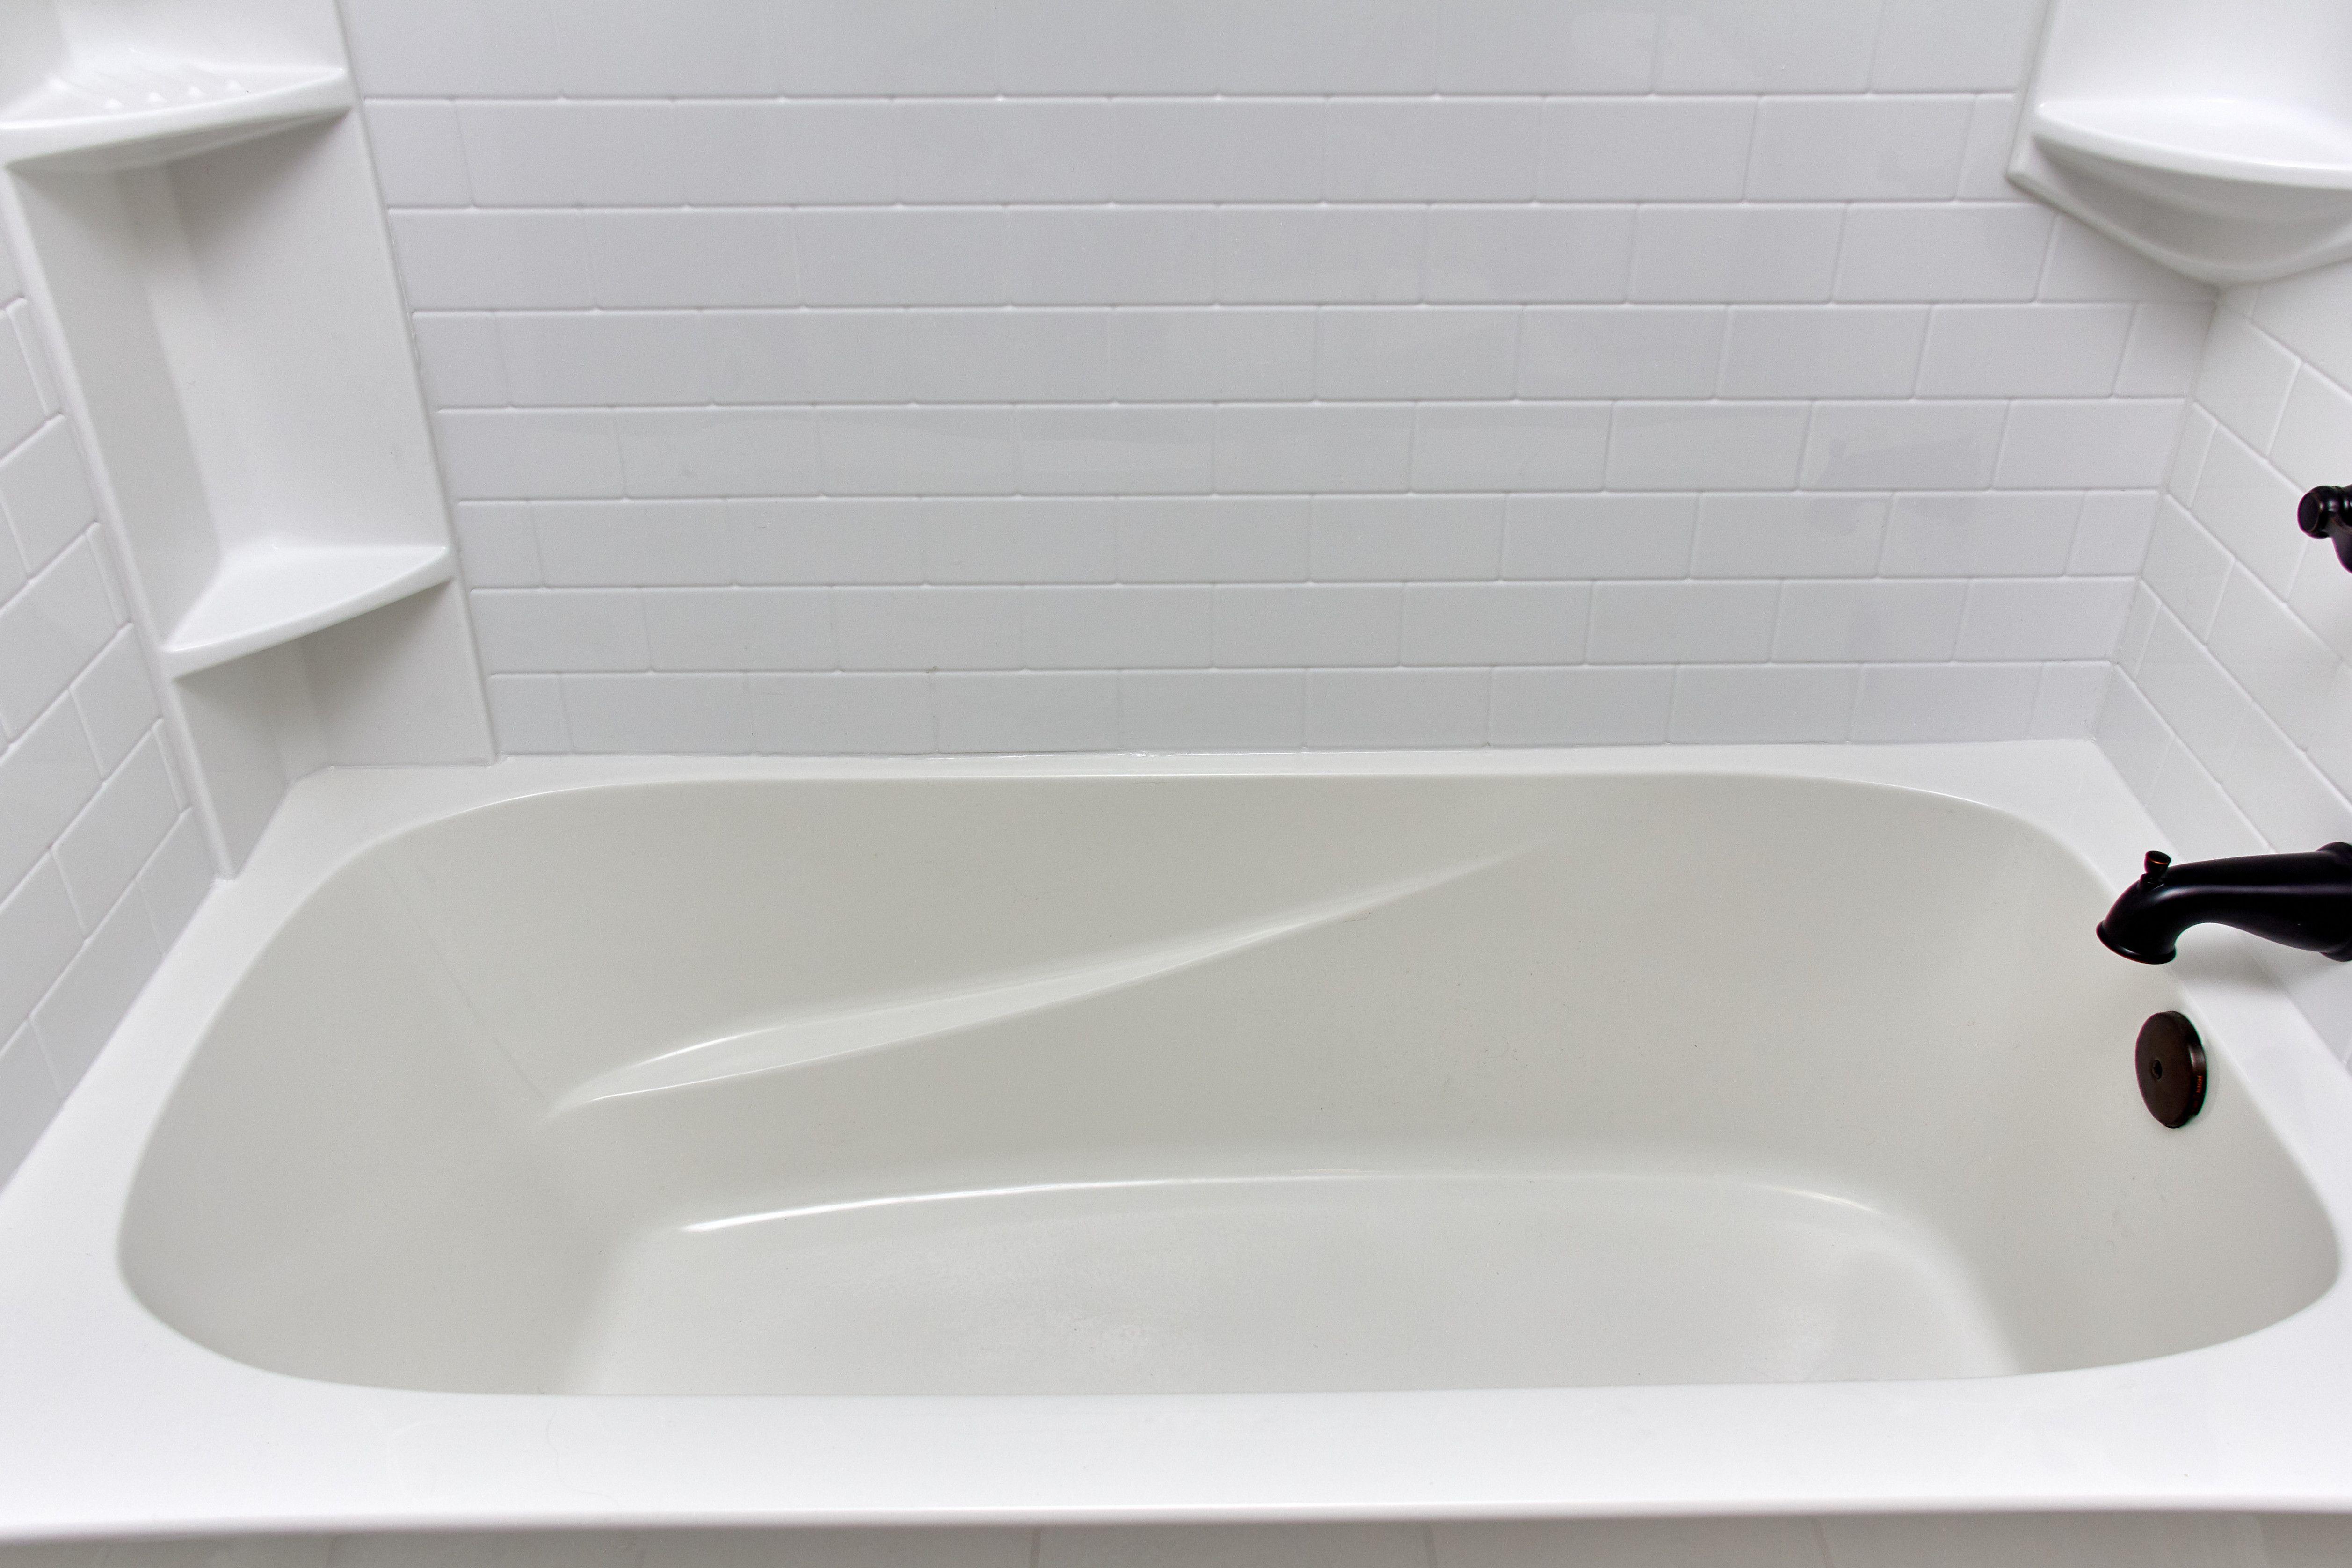 services siding concrete remodel water drainage bathroom retaining bathtub remodeling wall omaha